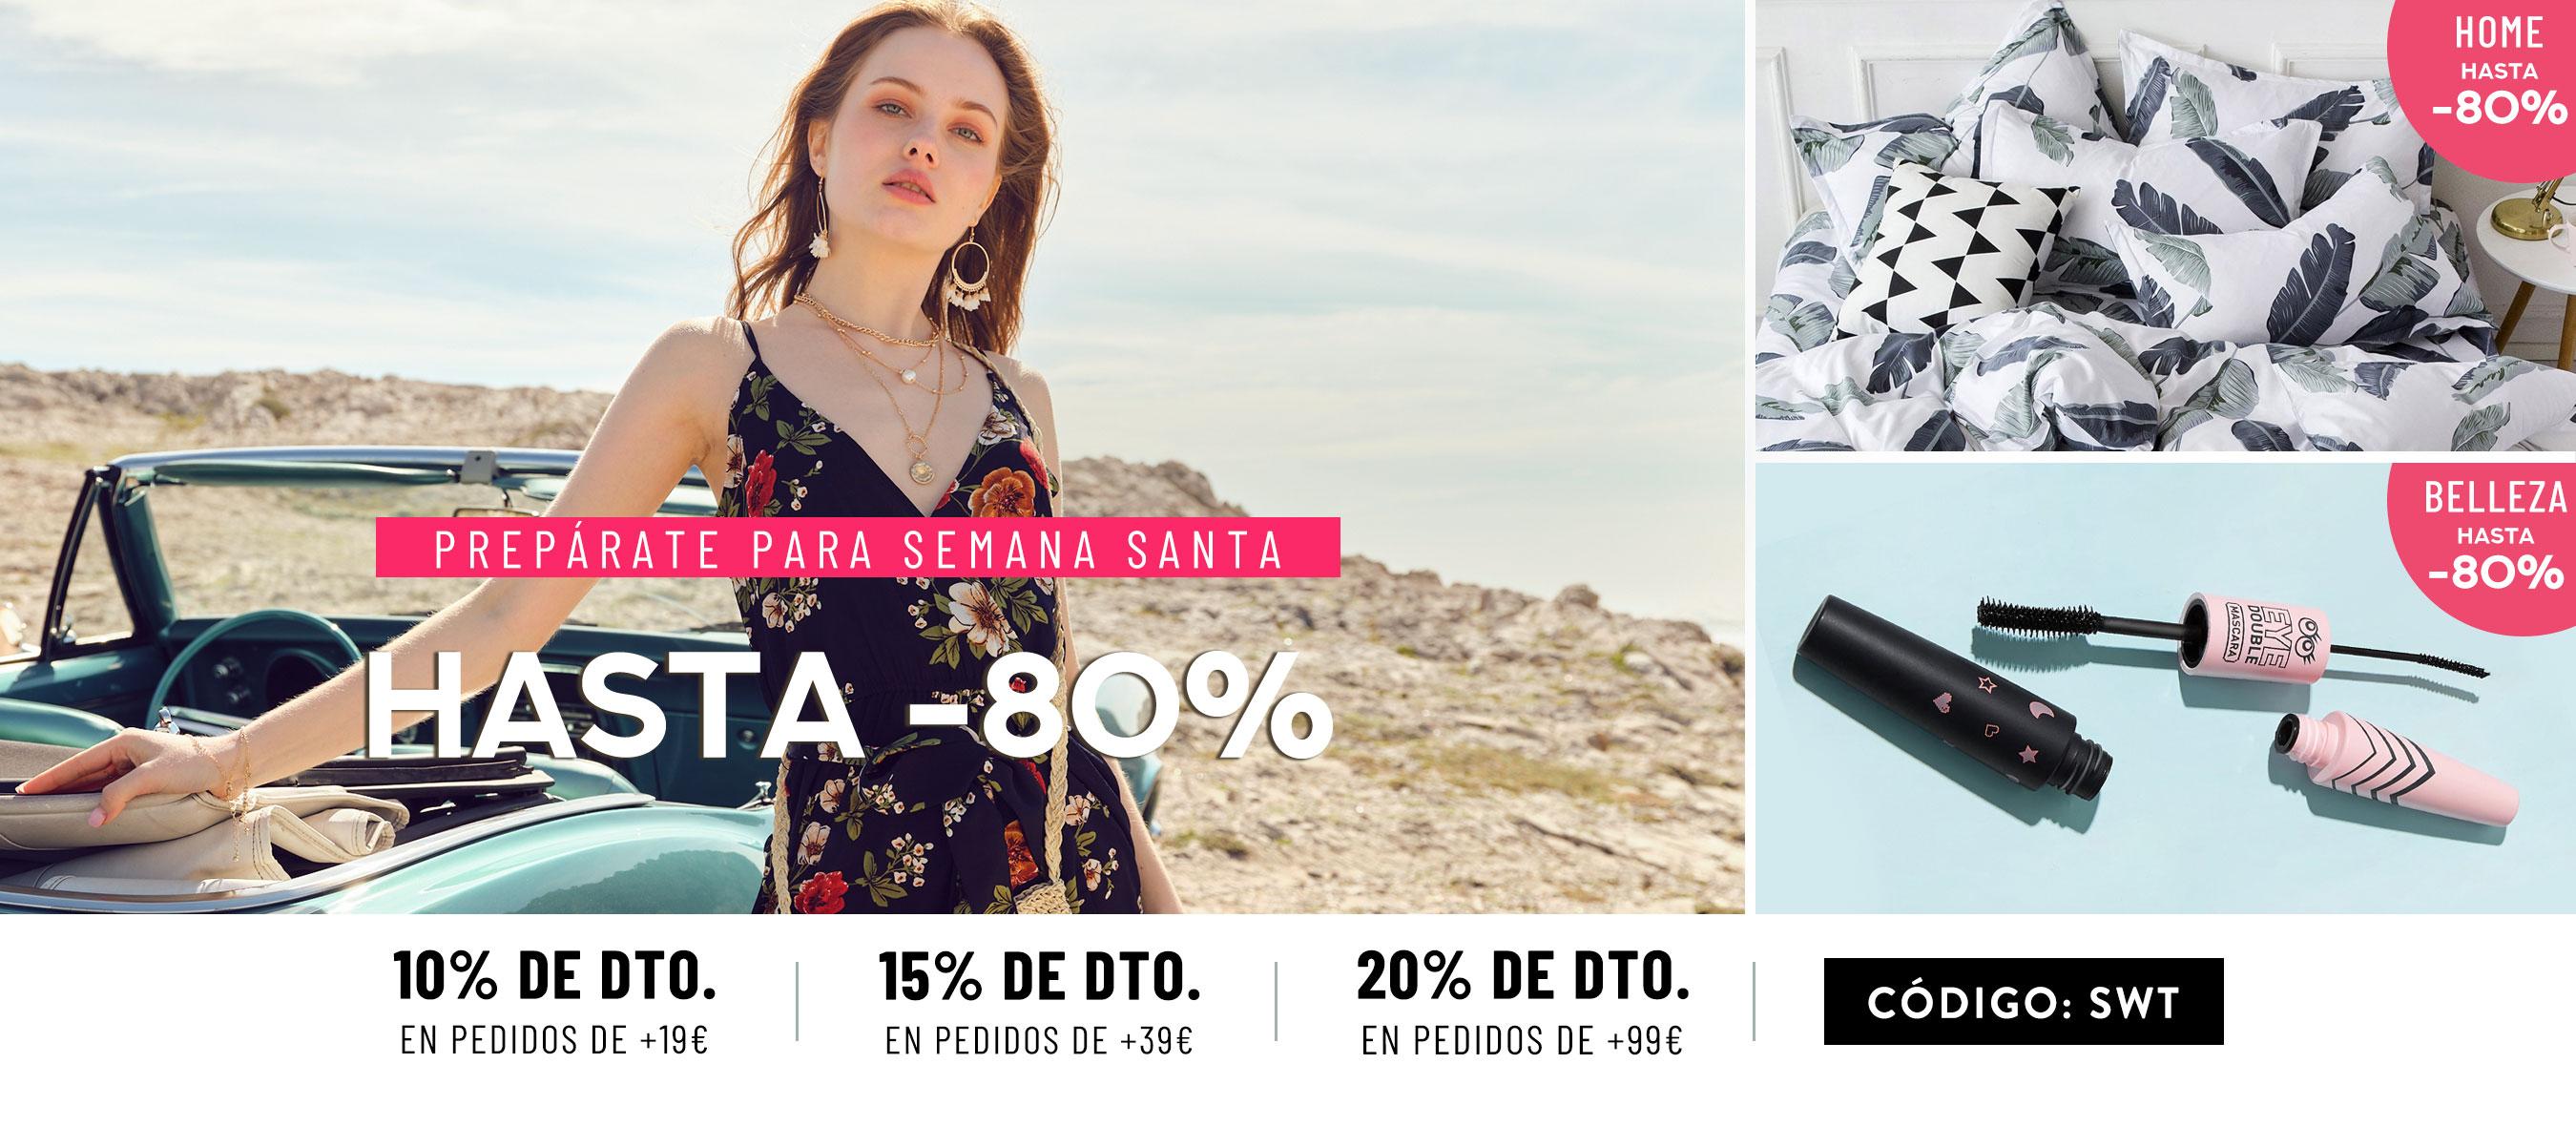 15% de descuento en shein por compras superior a 39€